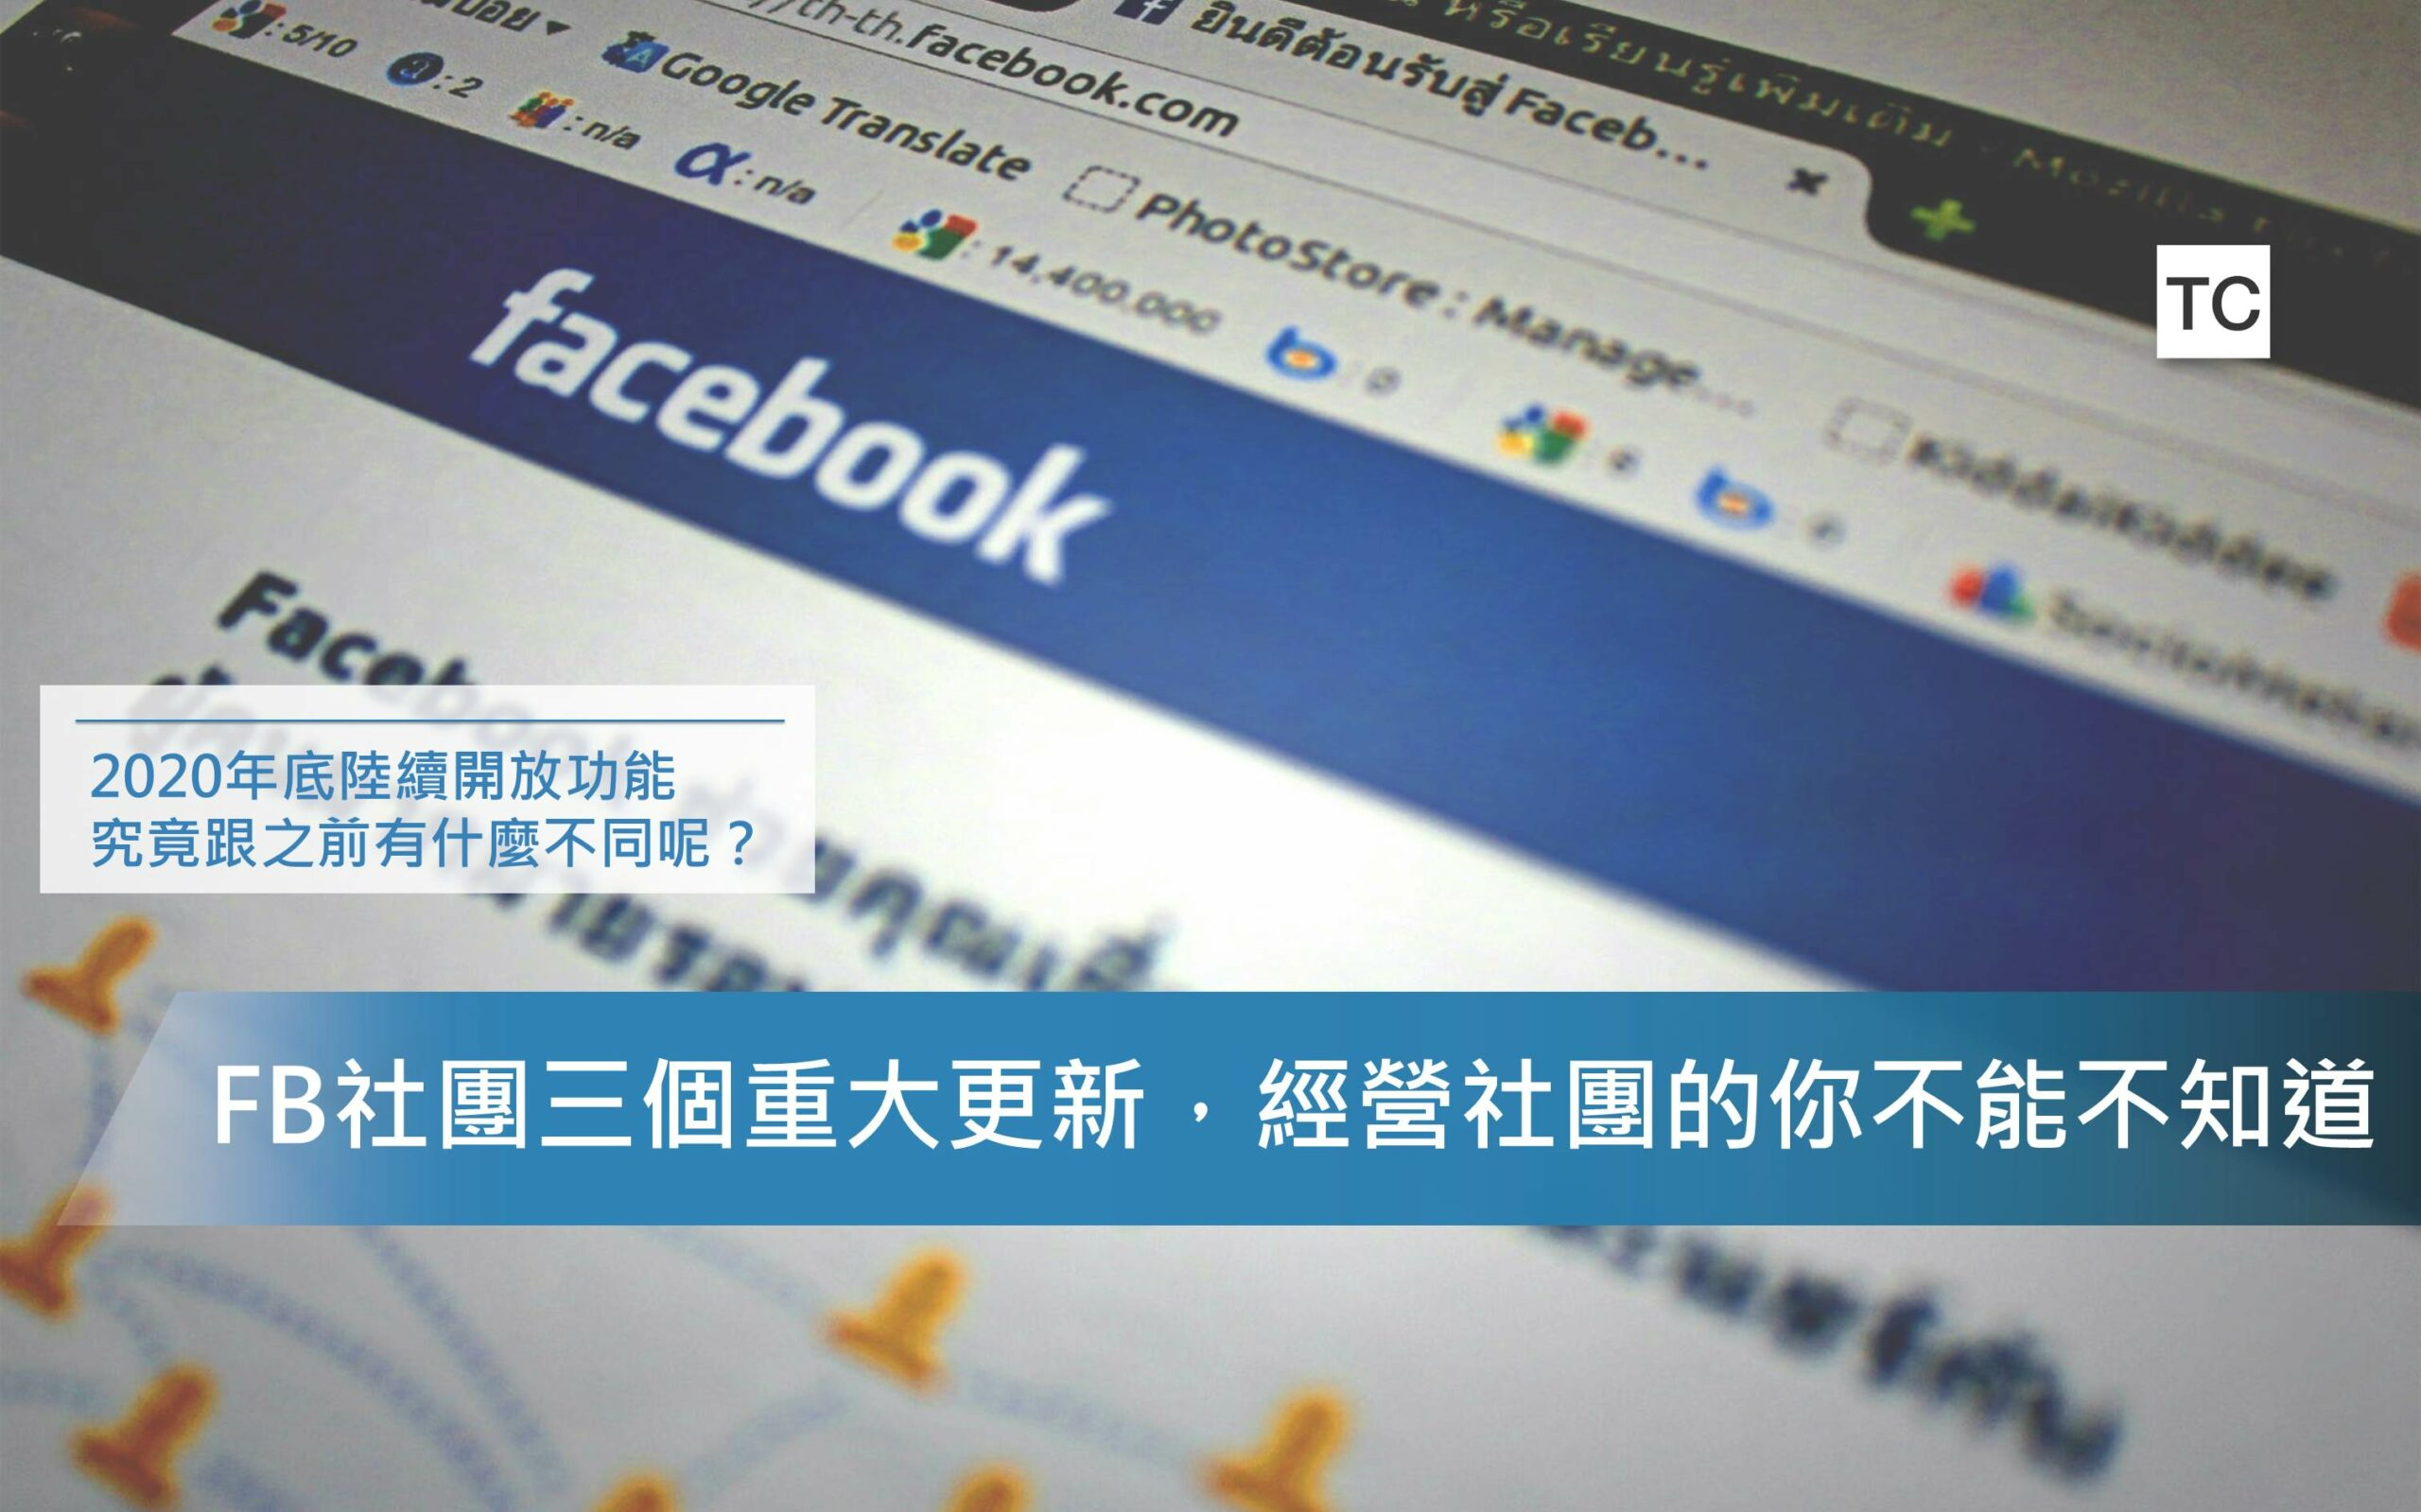 FB社團重要更新|三個影響2021年社團經營模式的調整